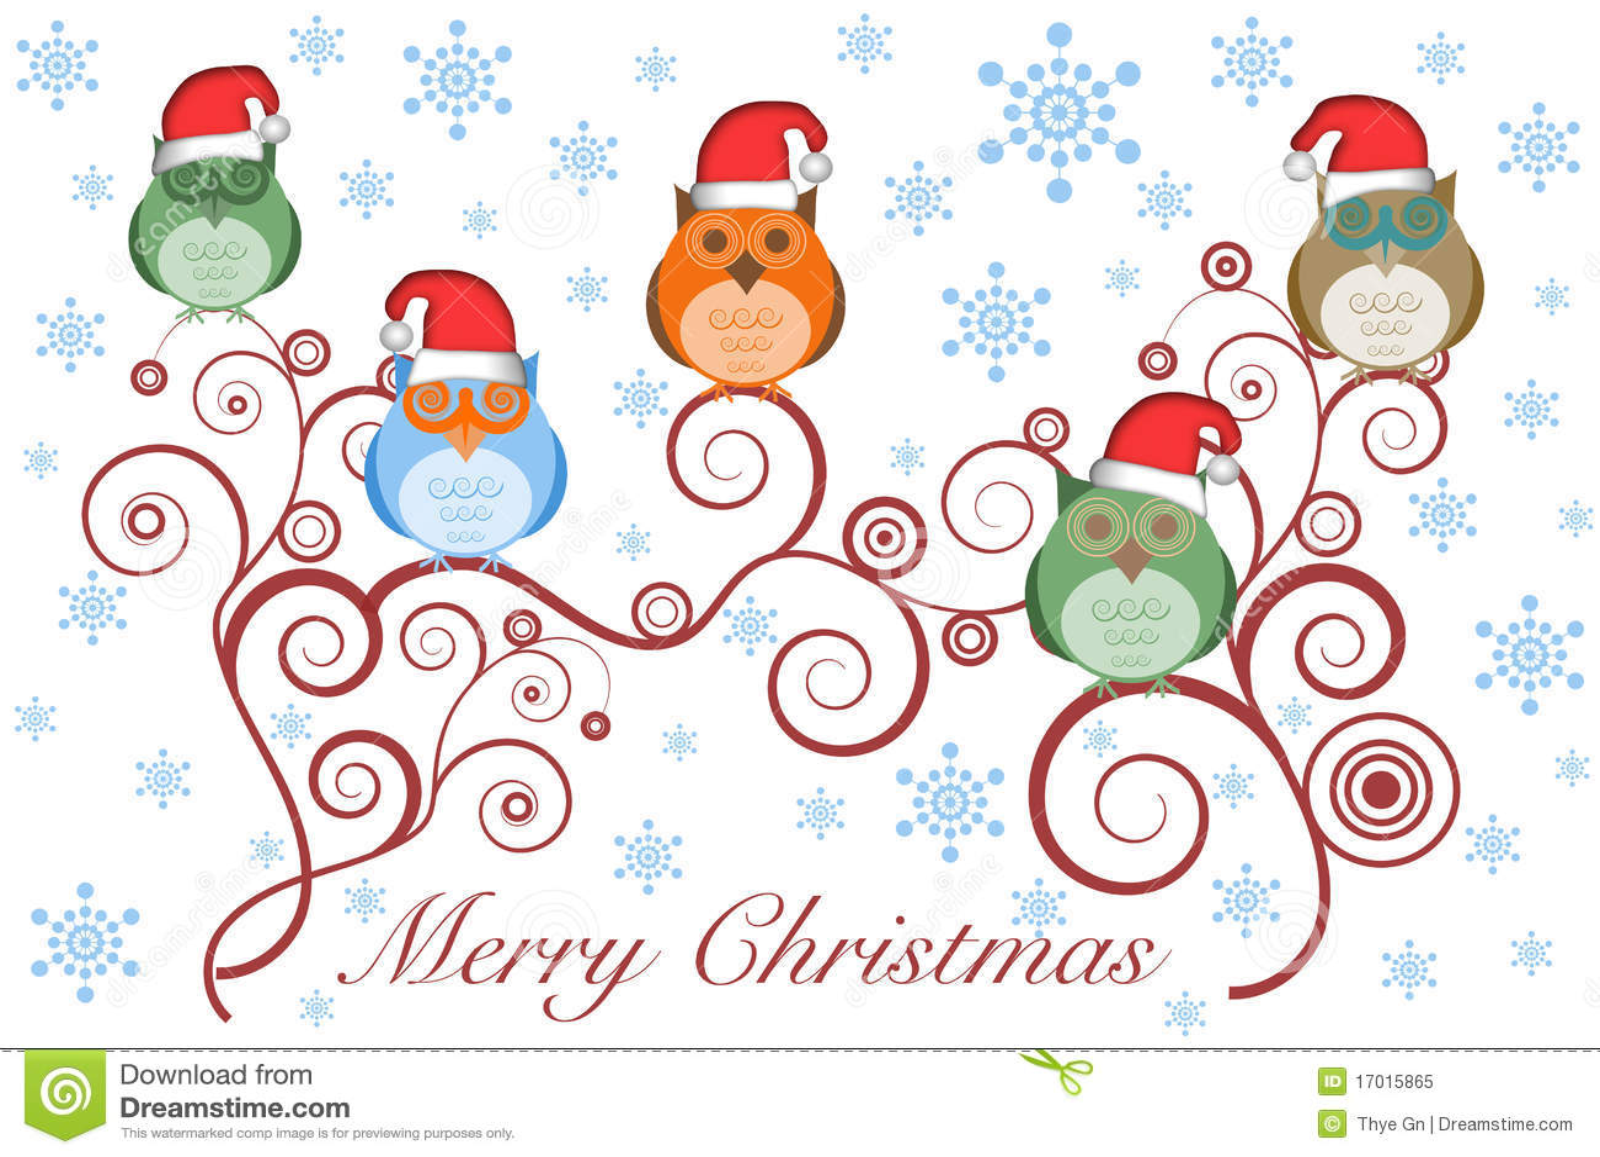 Christmas Owls With Santa Hat On Tree Royalty Free Stock Photo - Image ...